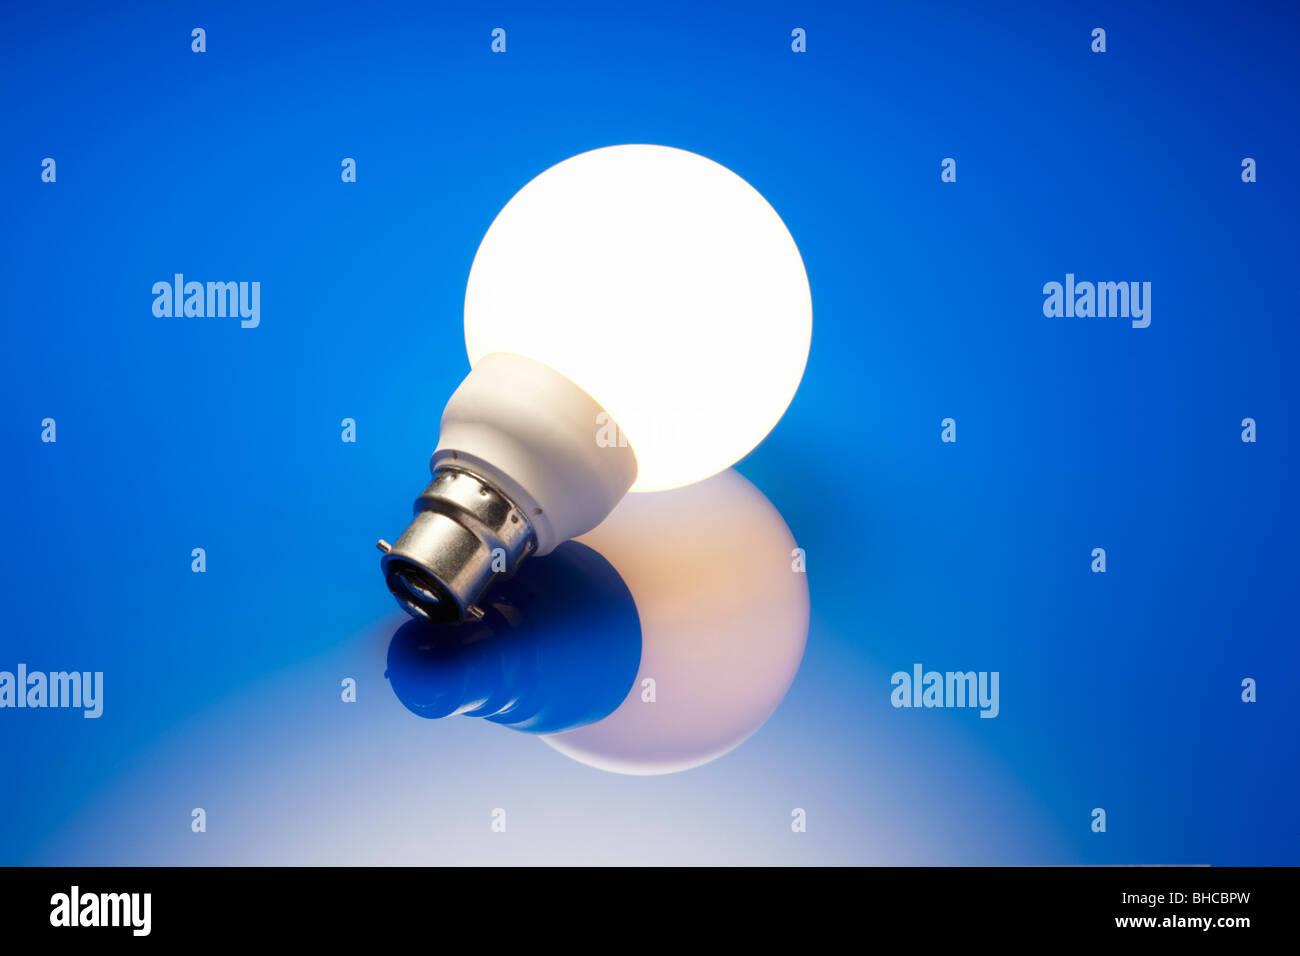 Risparmio energetico lampada accesa Immagini Stock